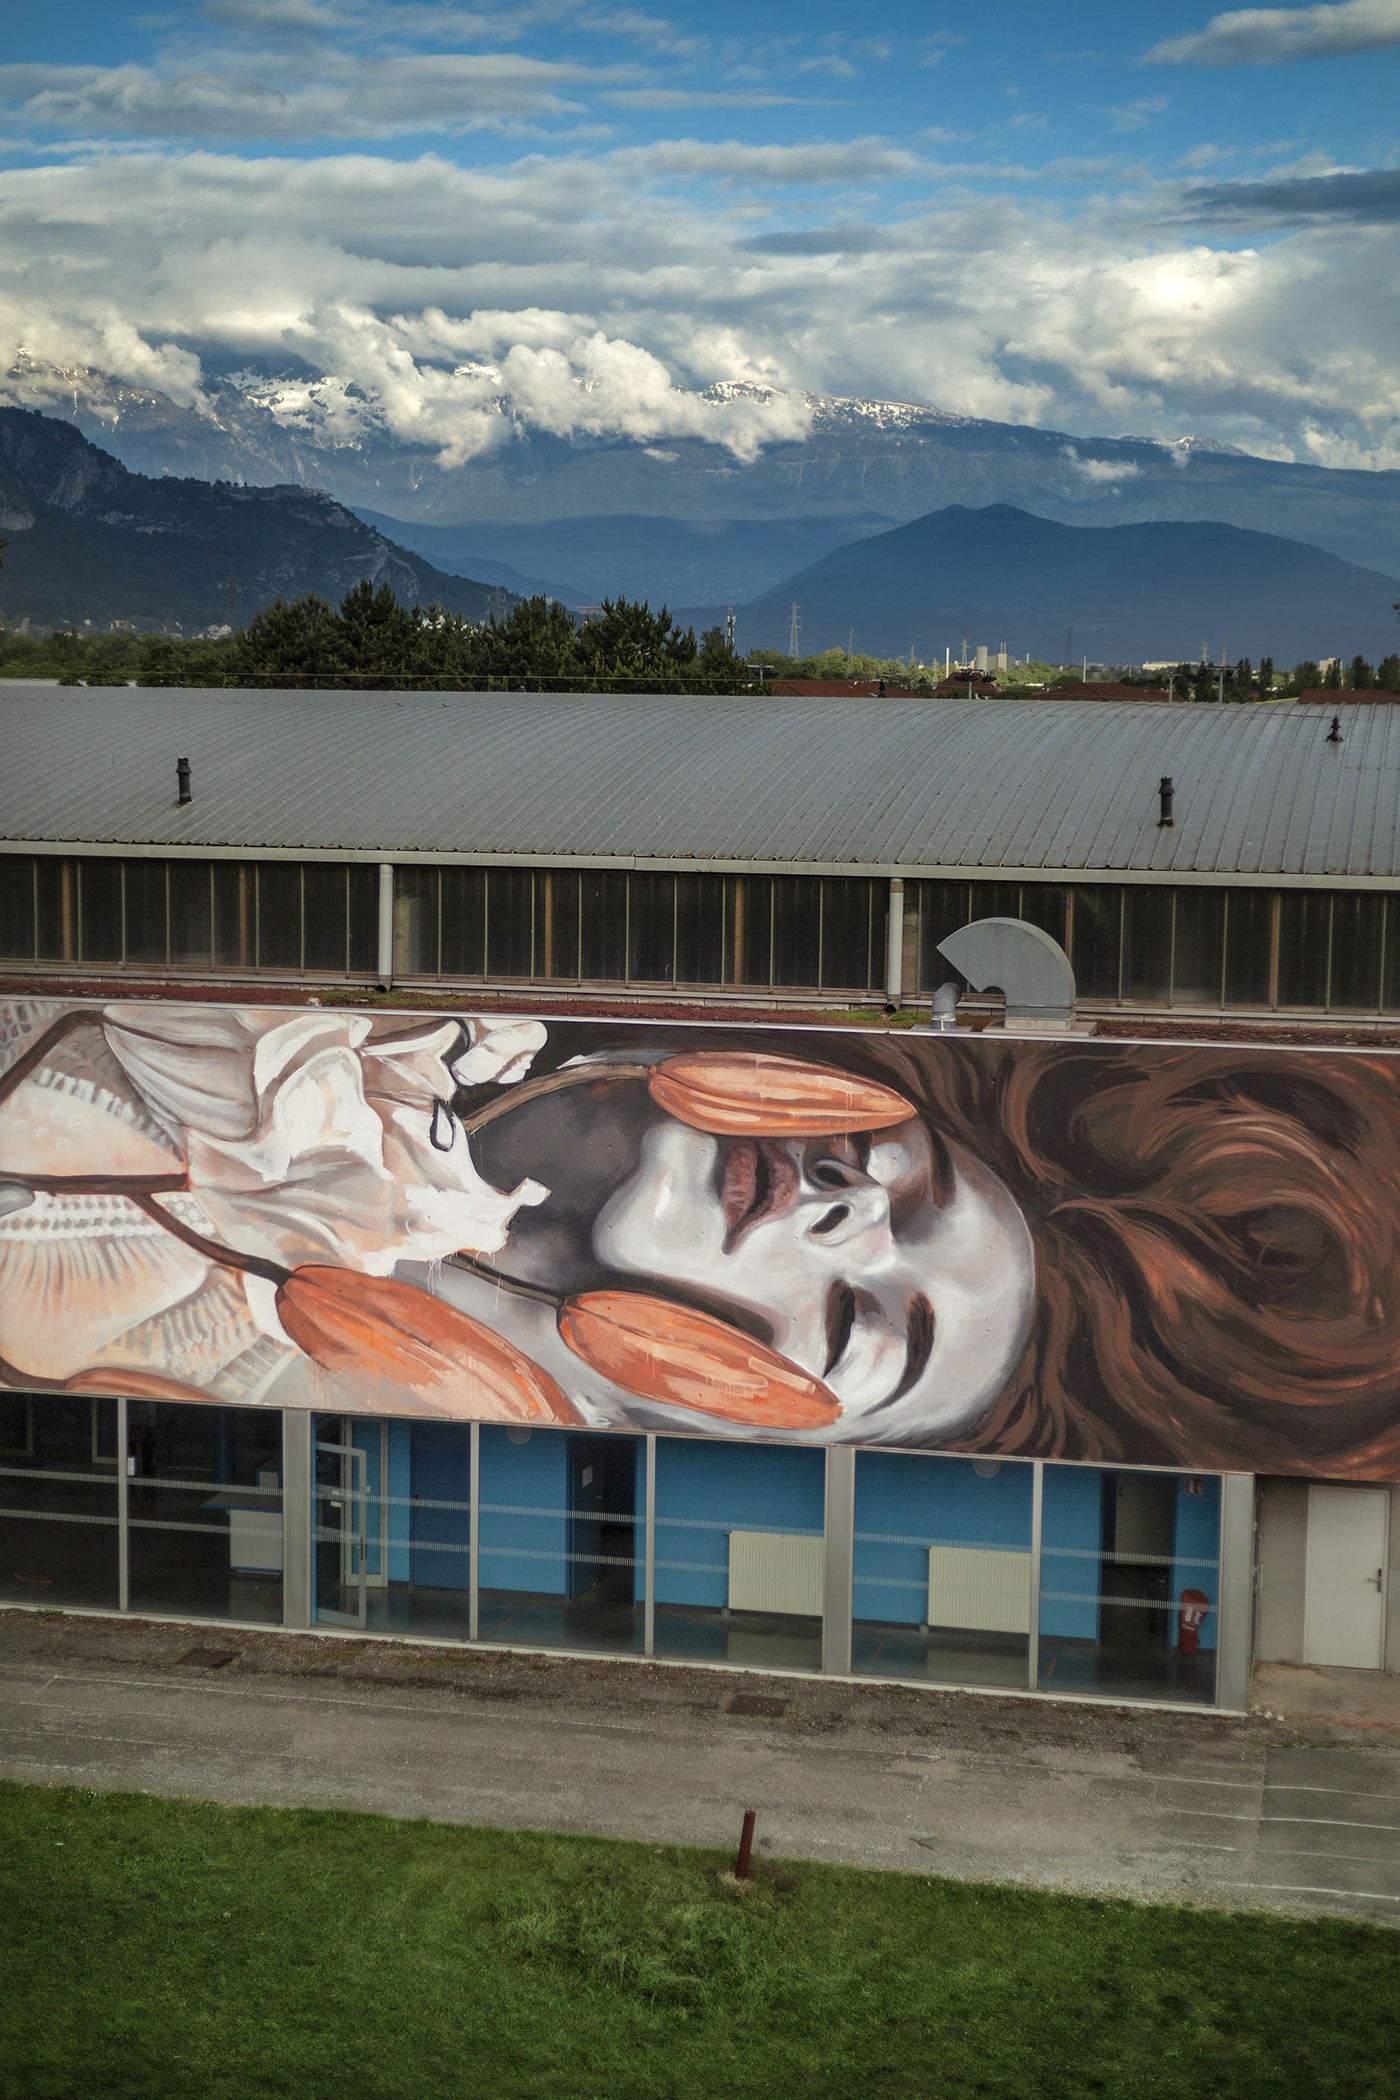 arte urbano fine art Graffiti Mural Street Art  urban art